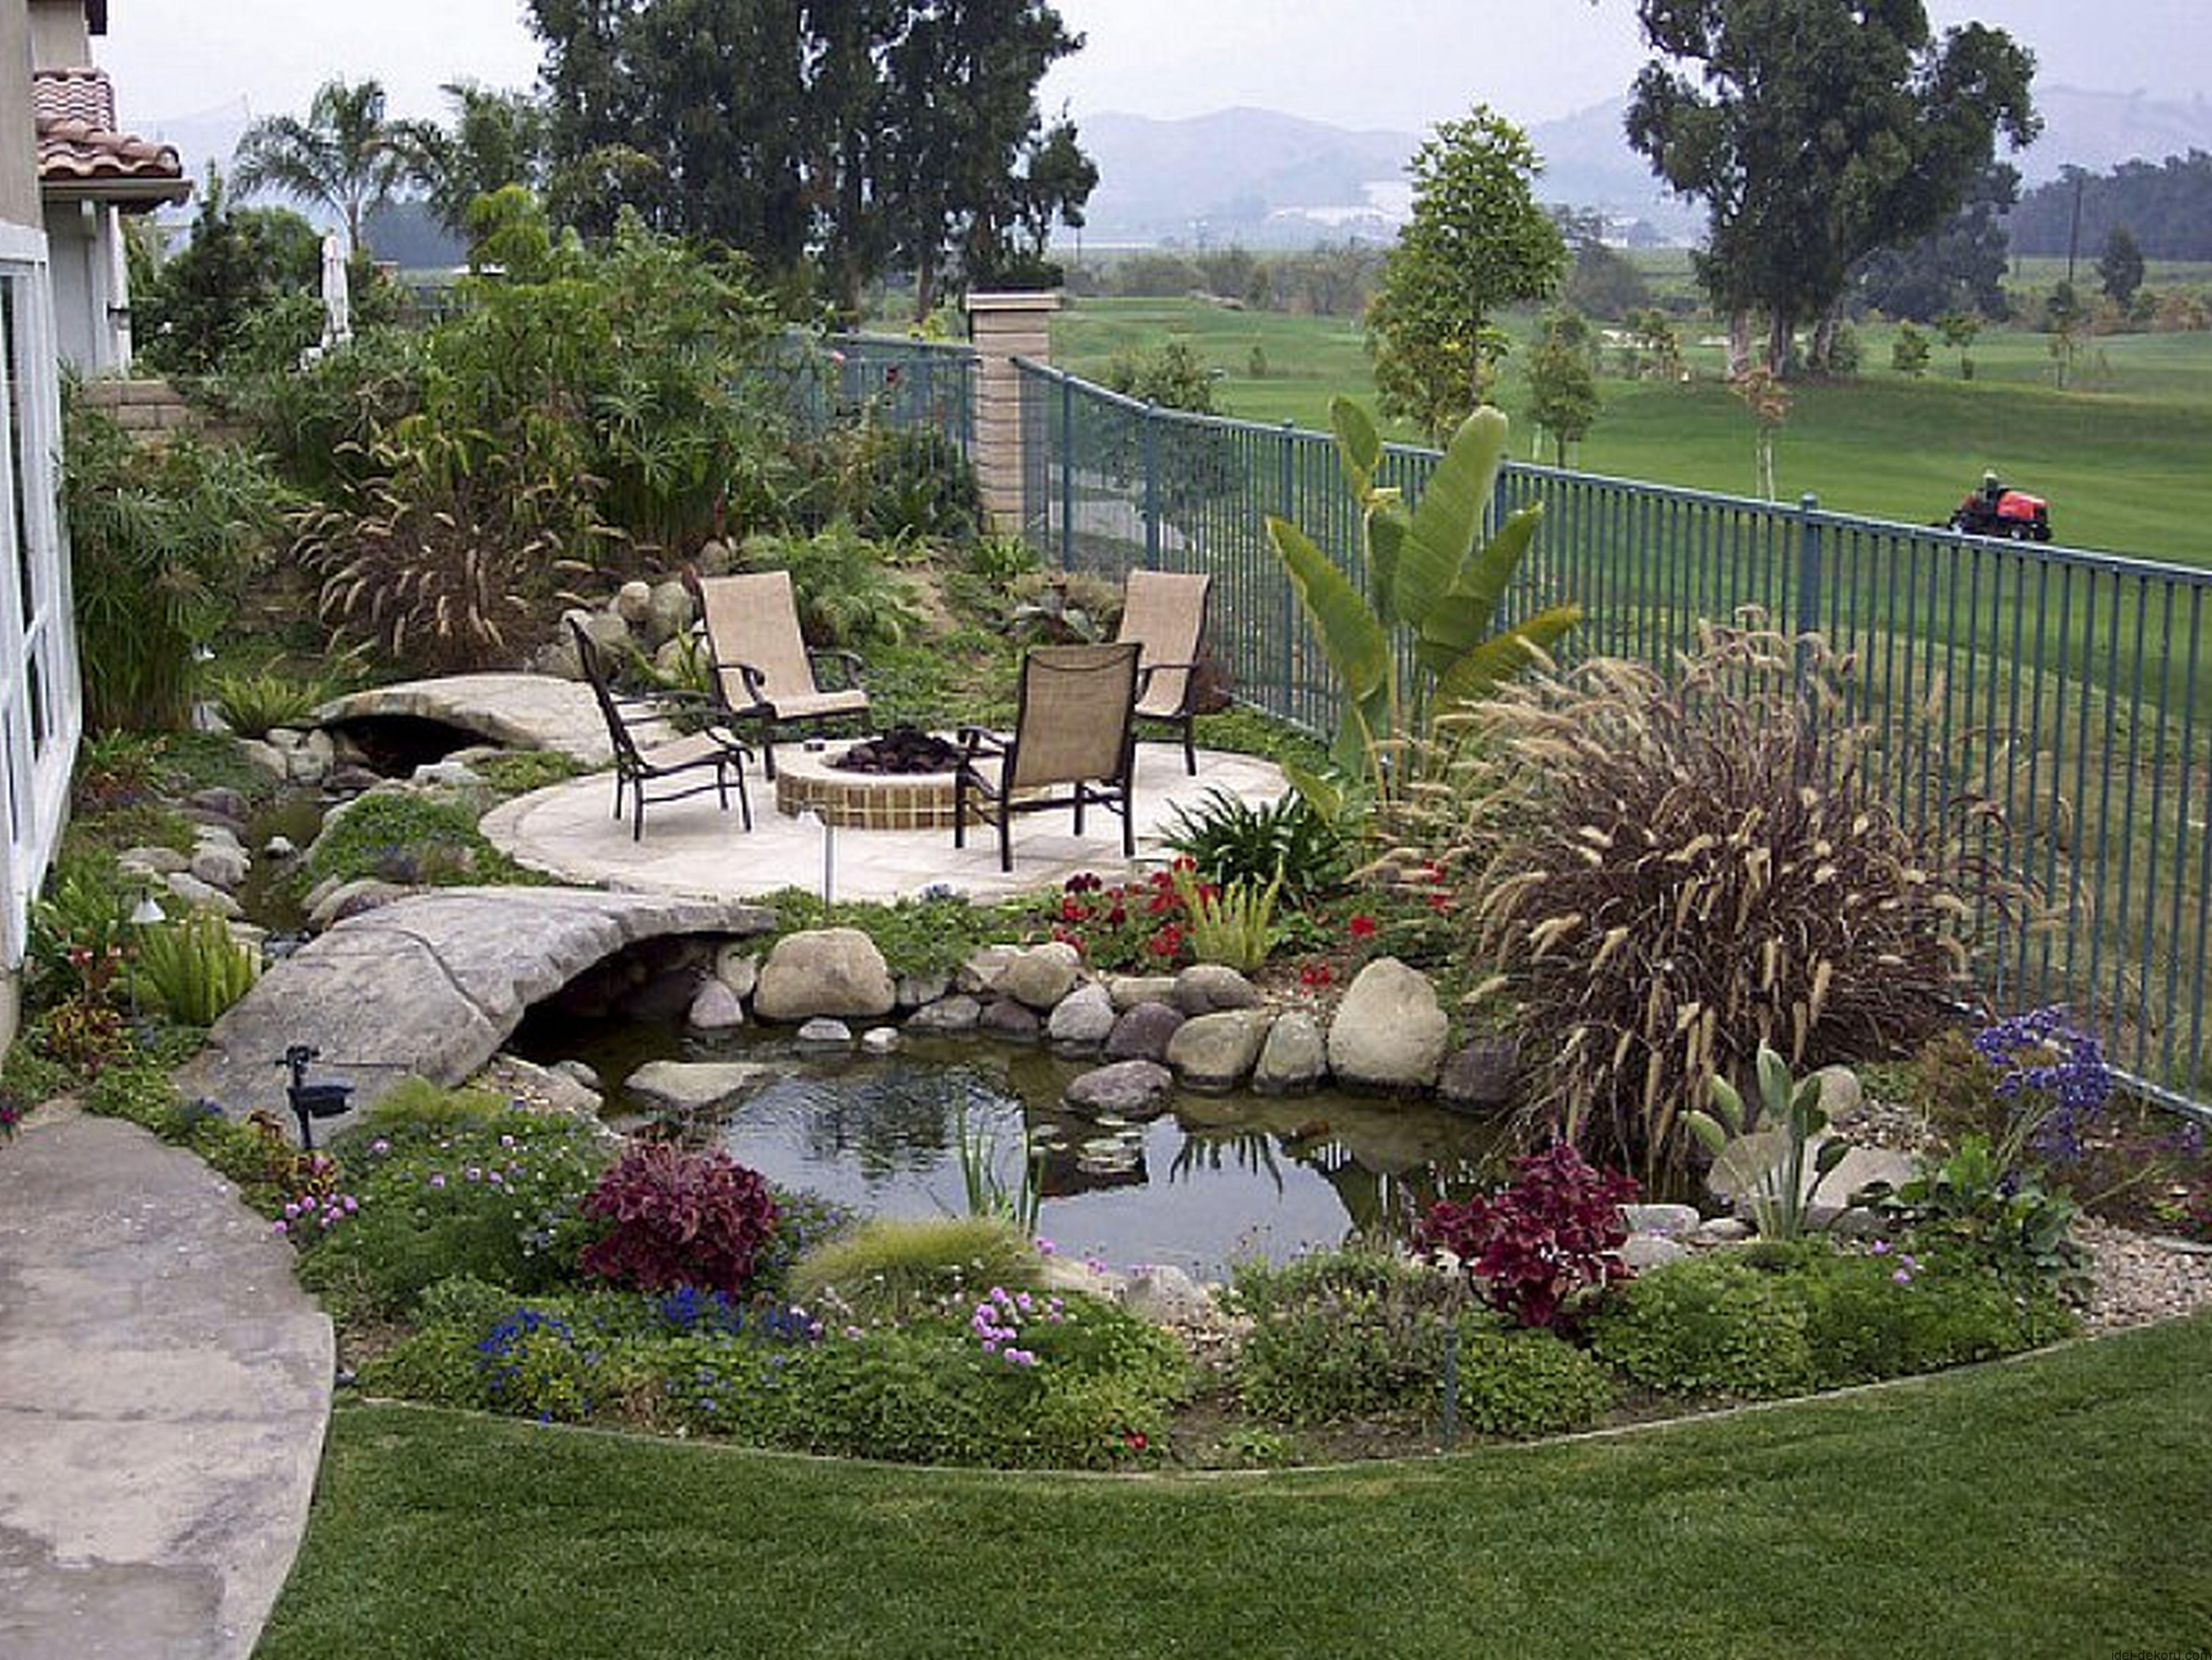 landscaping-design-backyard-landscaping-landscape-patio-deck-landscaping-photos-deck-landscaping-with-brick-patio-on-the-side-deck-landscaping-quad-cities-deck-landscaping-pictures-deck-landscapi